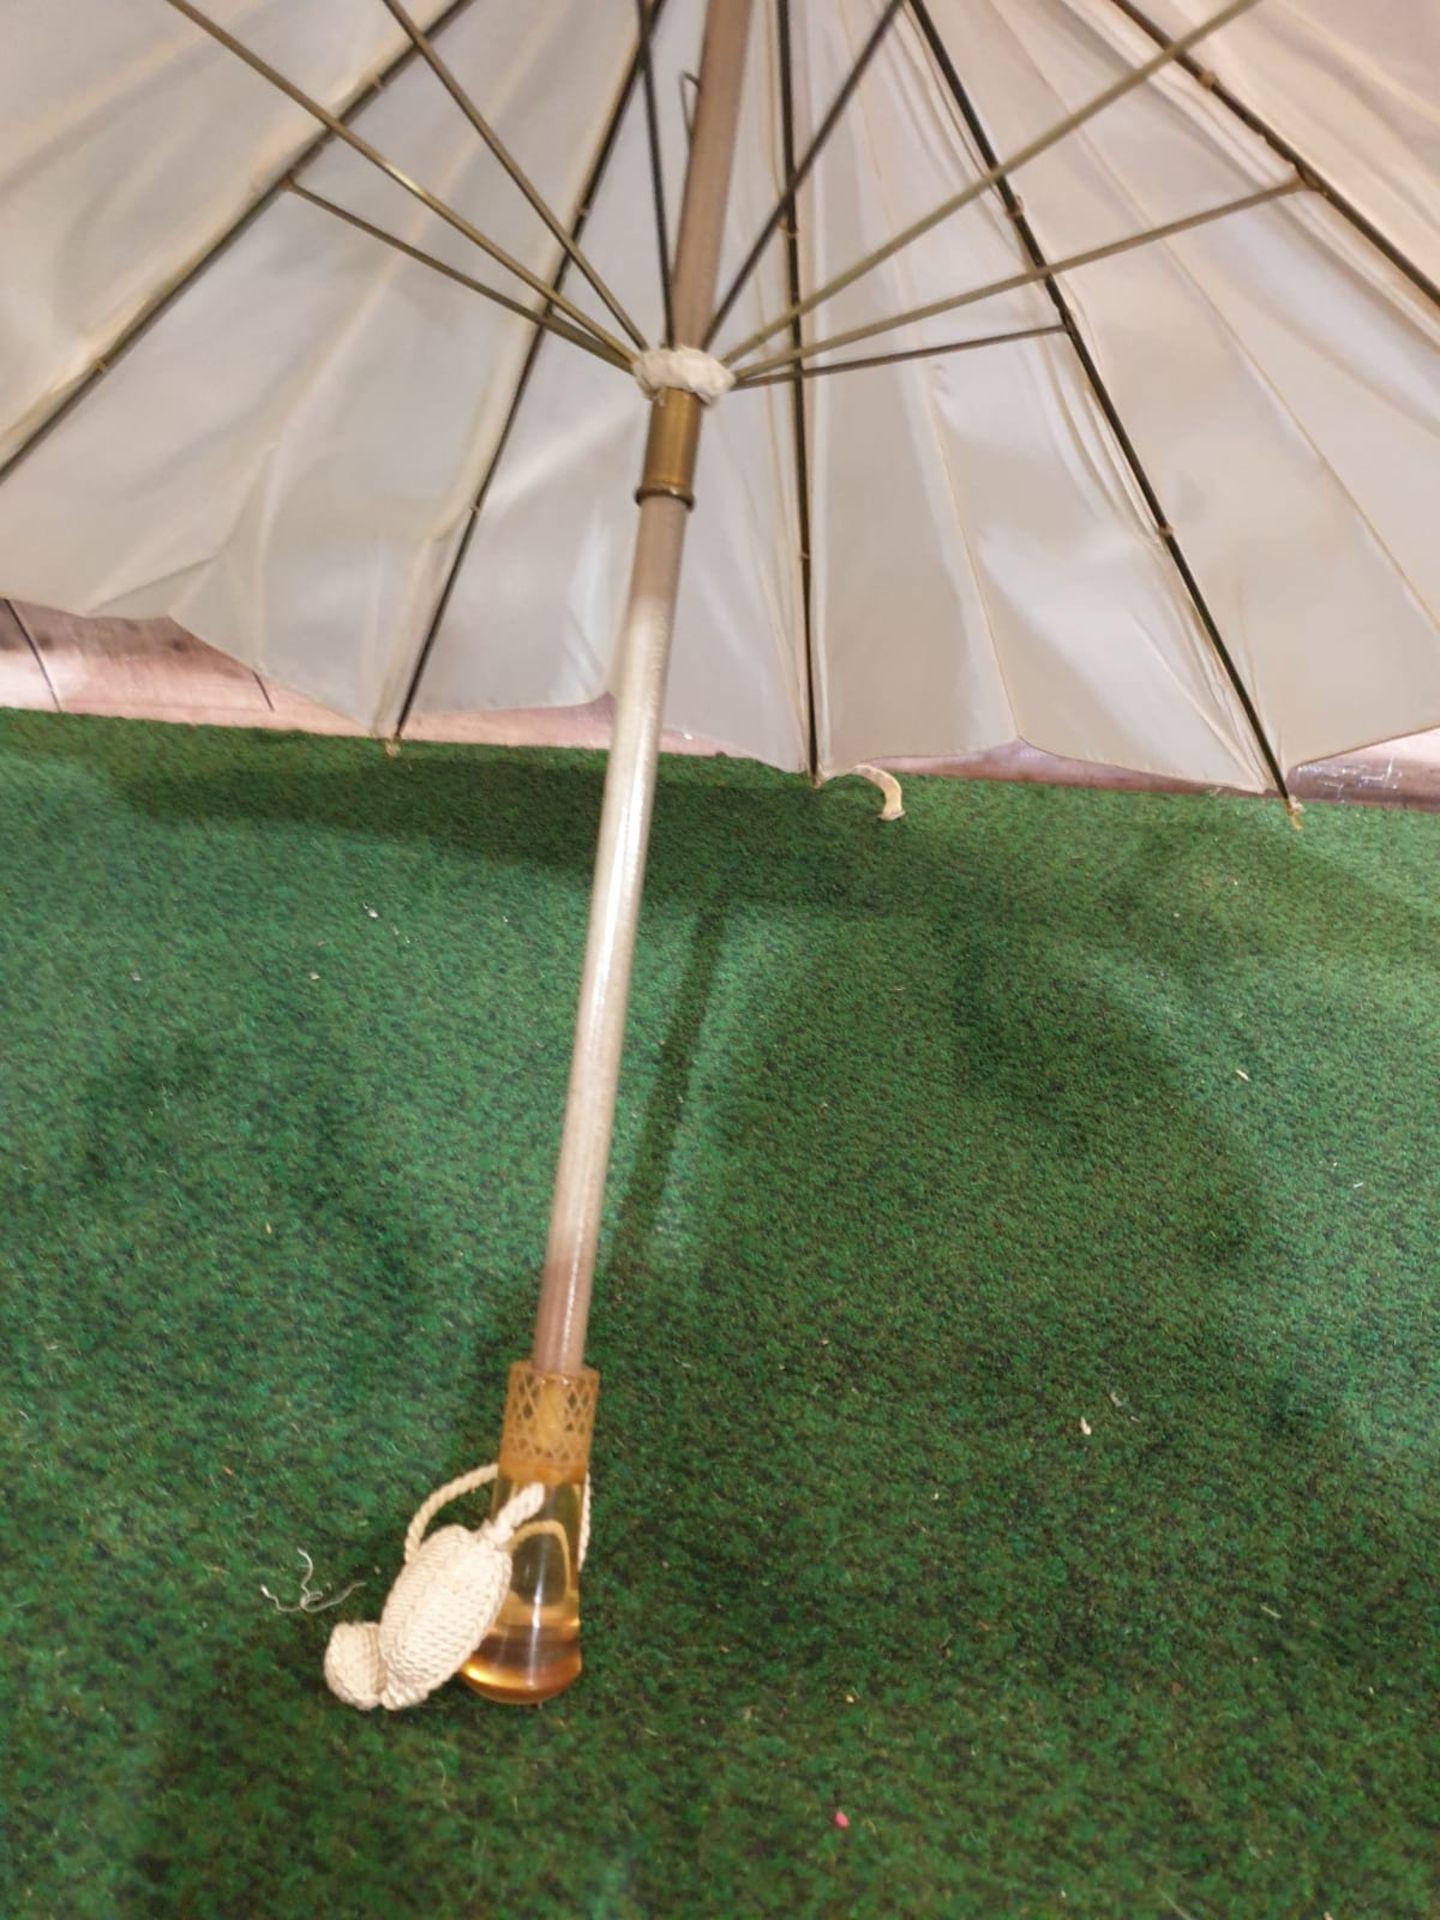 Ladies parasol Cream silk-like material - Yellow handle. Needs T.L.C. - Image 4 of 4